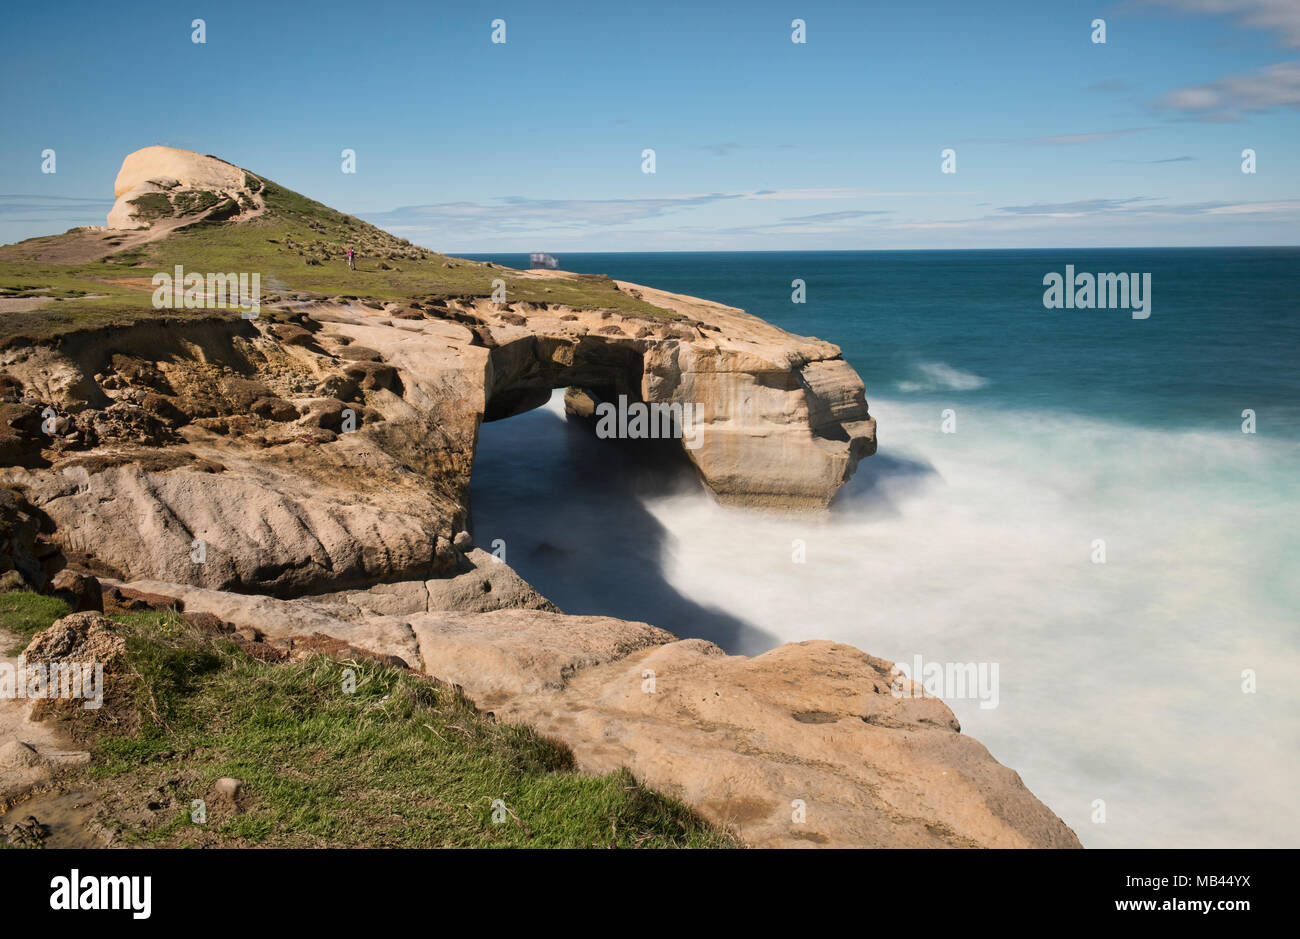 Dramatic Tunnel Beach, Dunedin, New Zealand - Stock Image